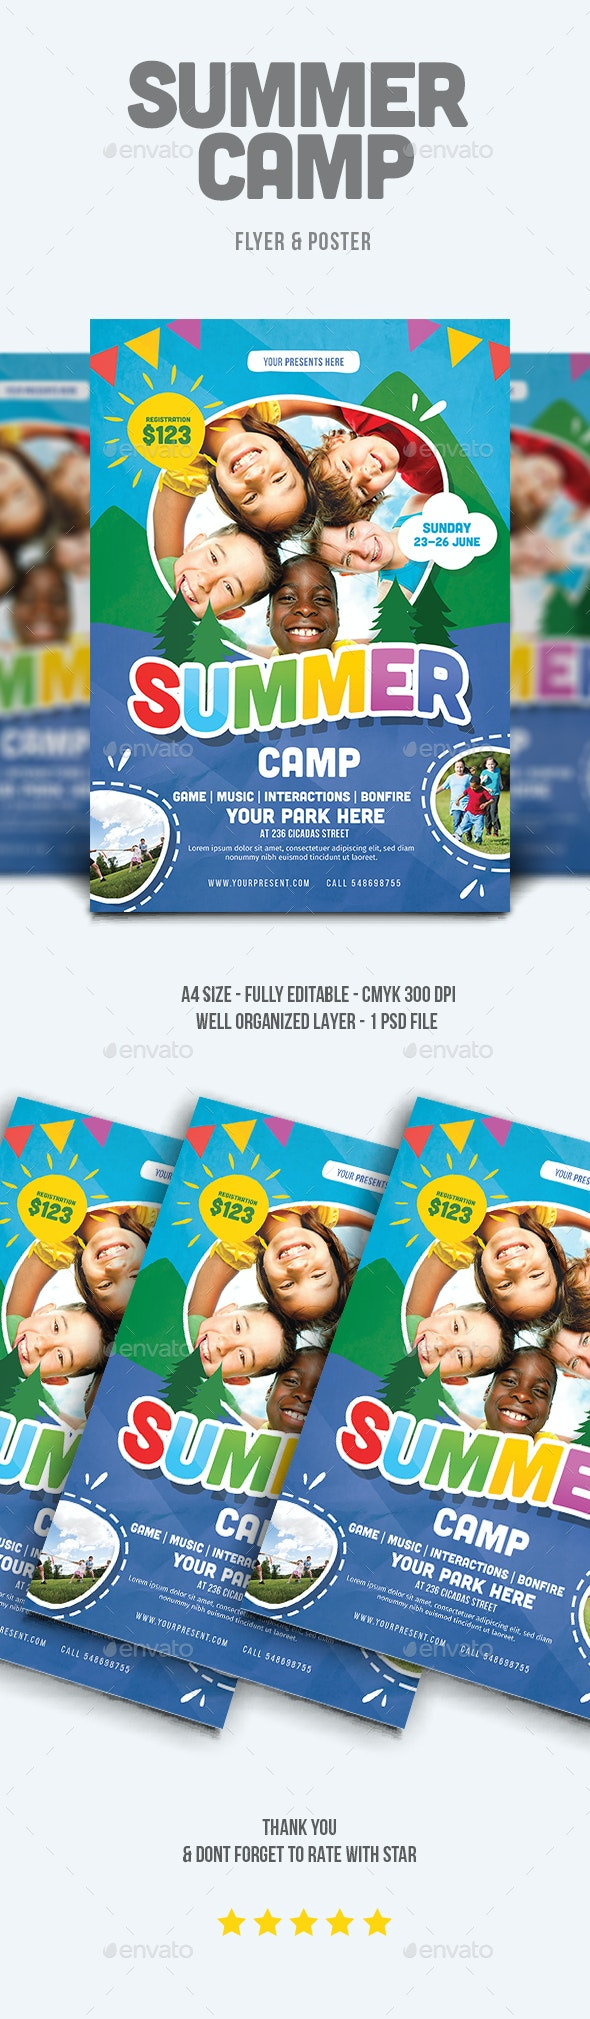 Summer Camp Flyer - Flyers Print Templates